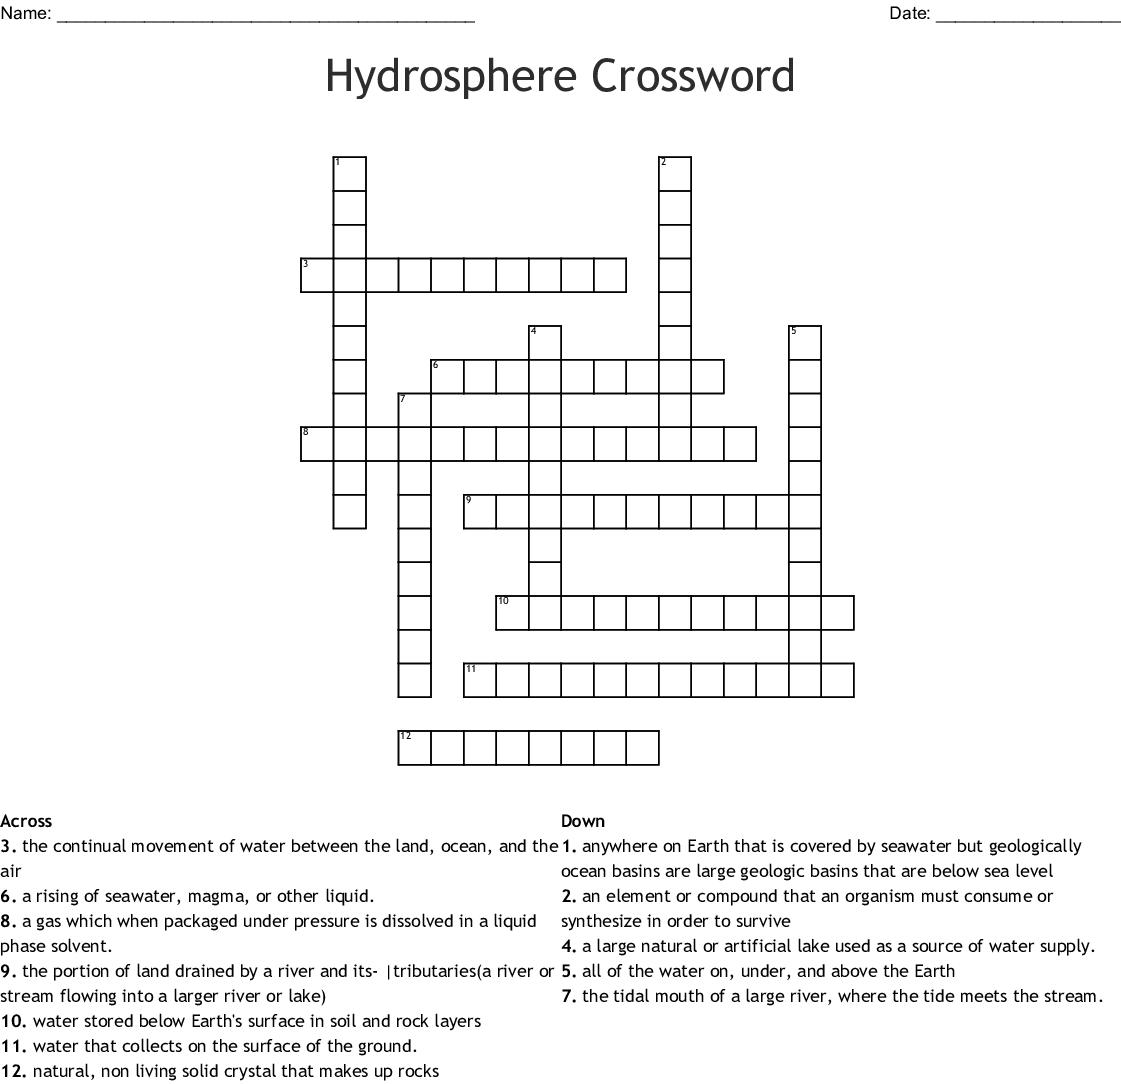 Hydrosphere Crossword